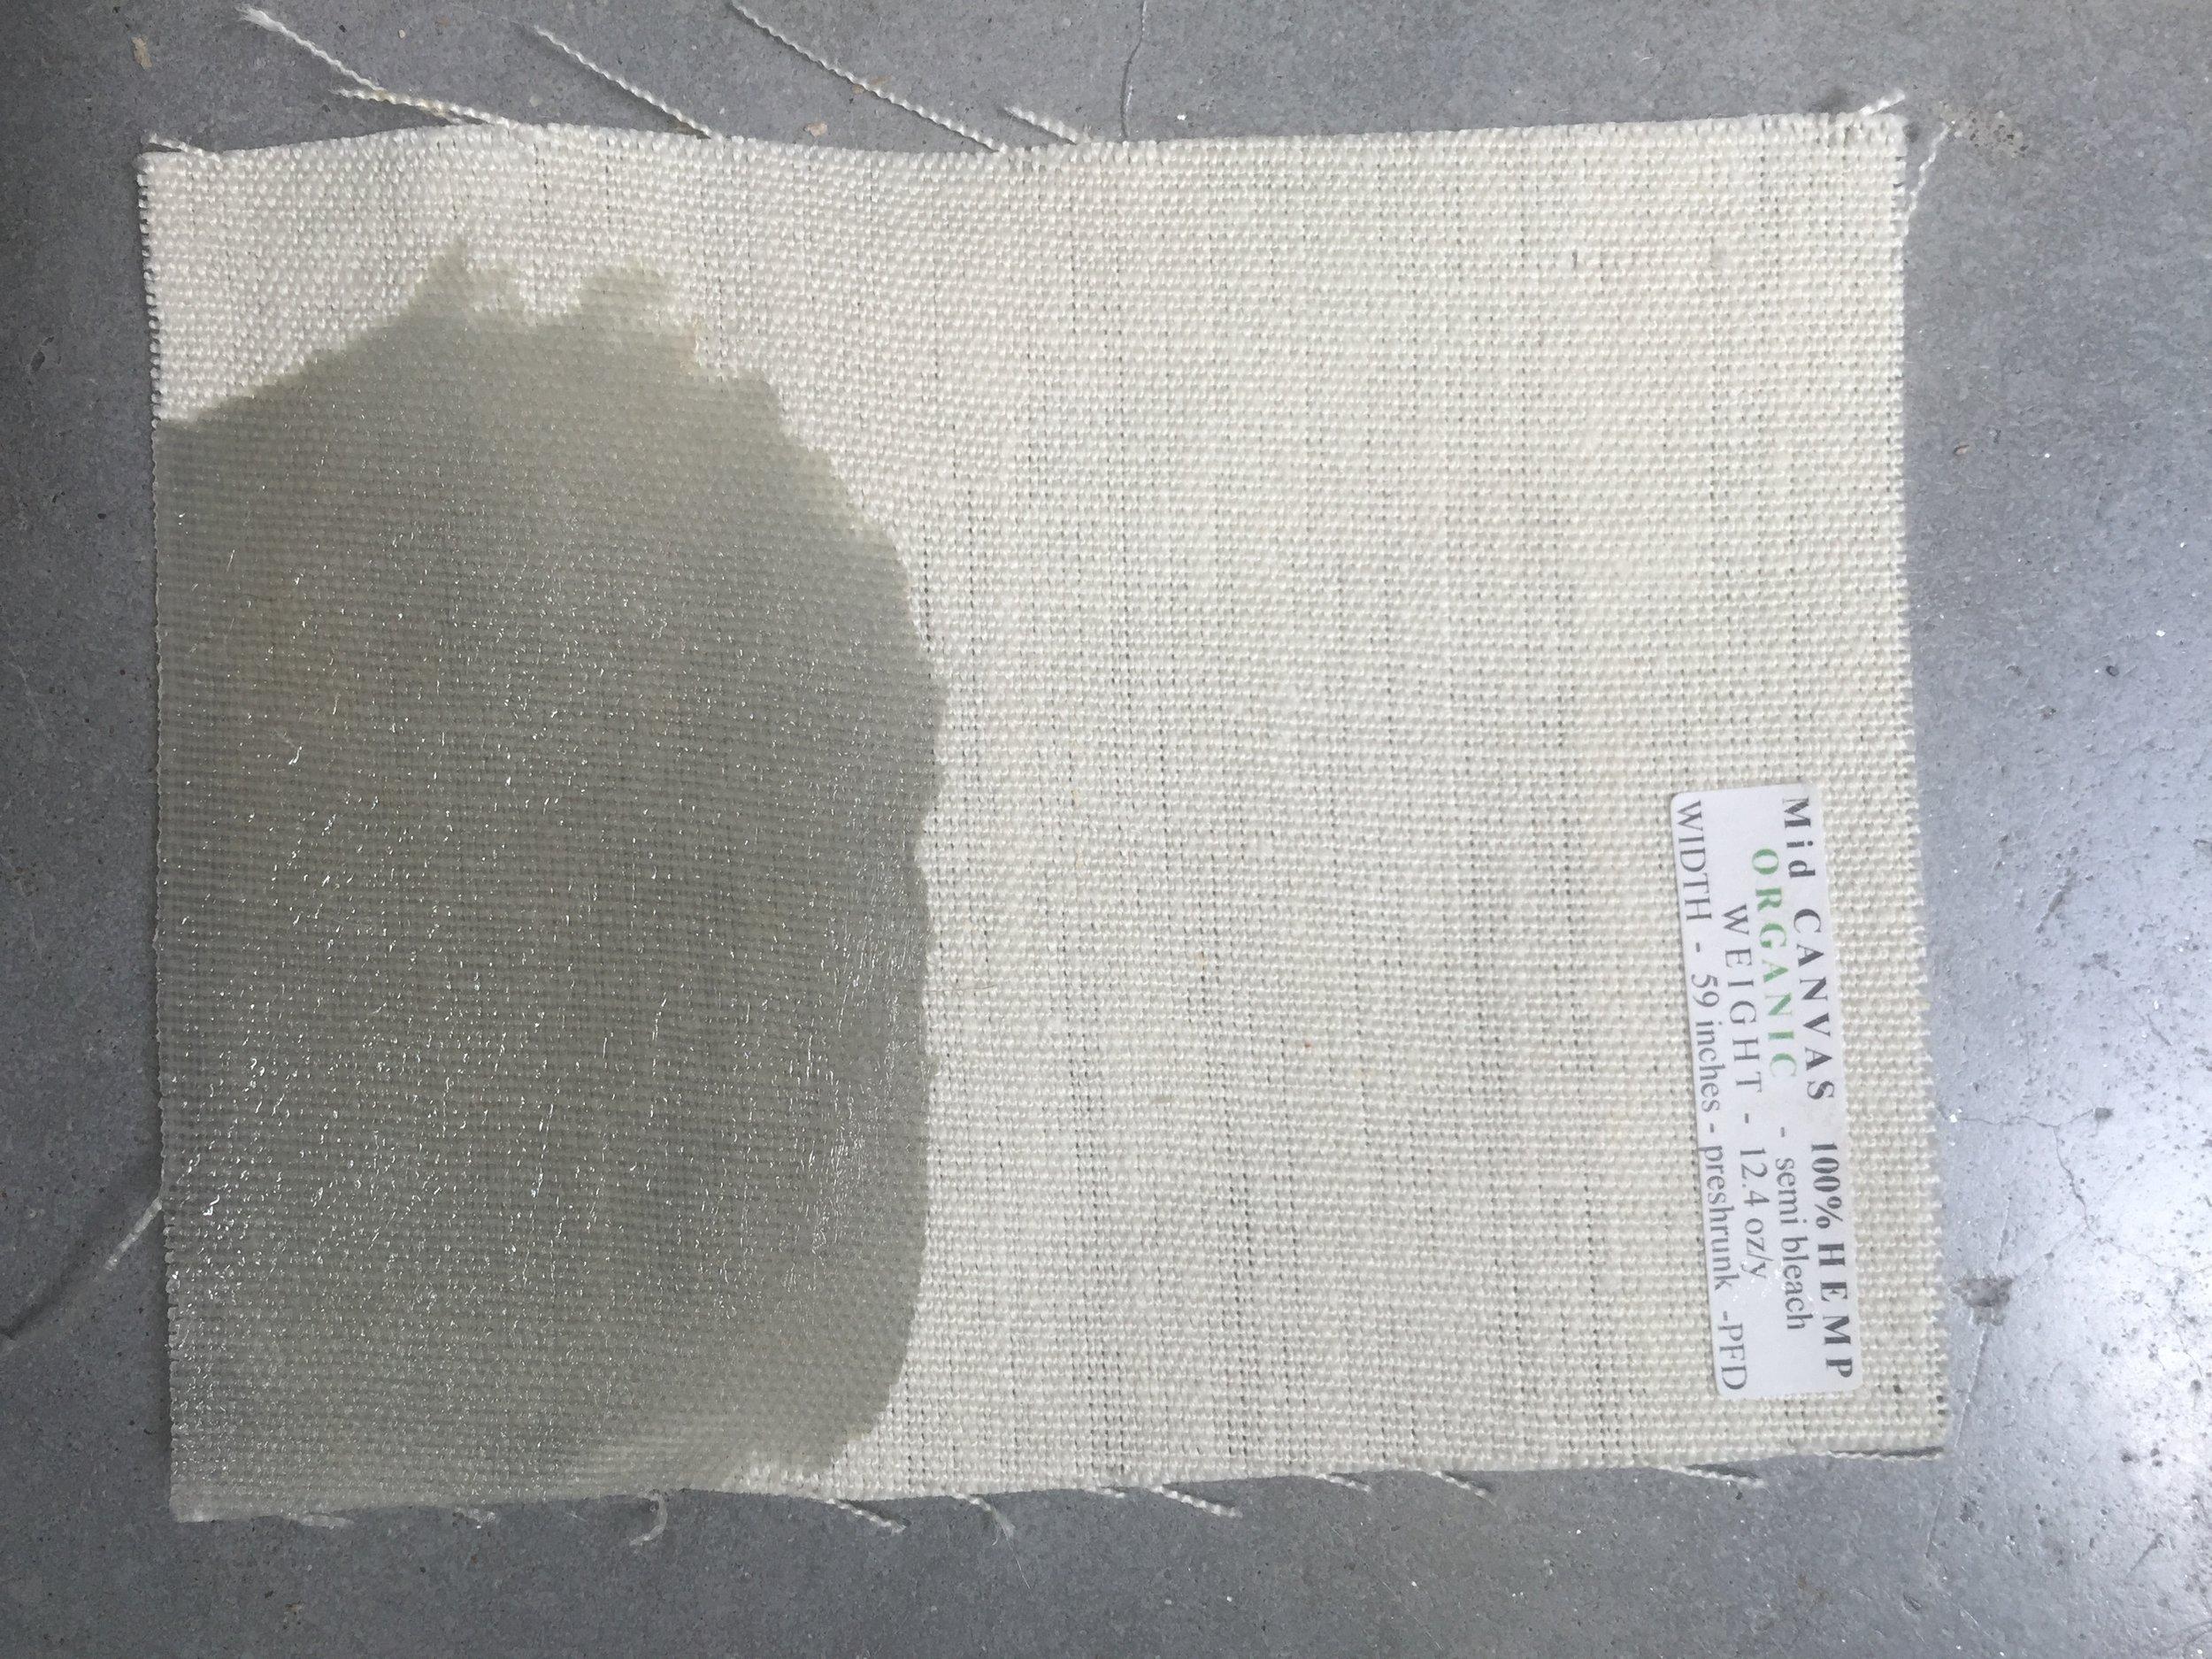 09 Mid Canvas hemp with supersap bio resin.JPG